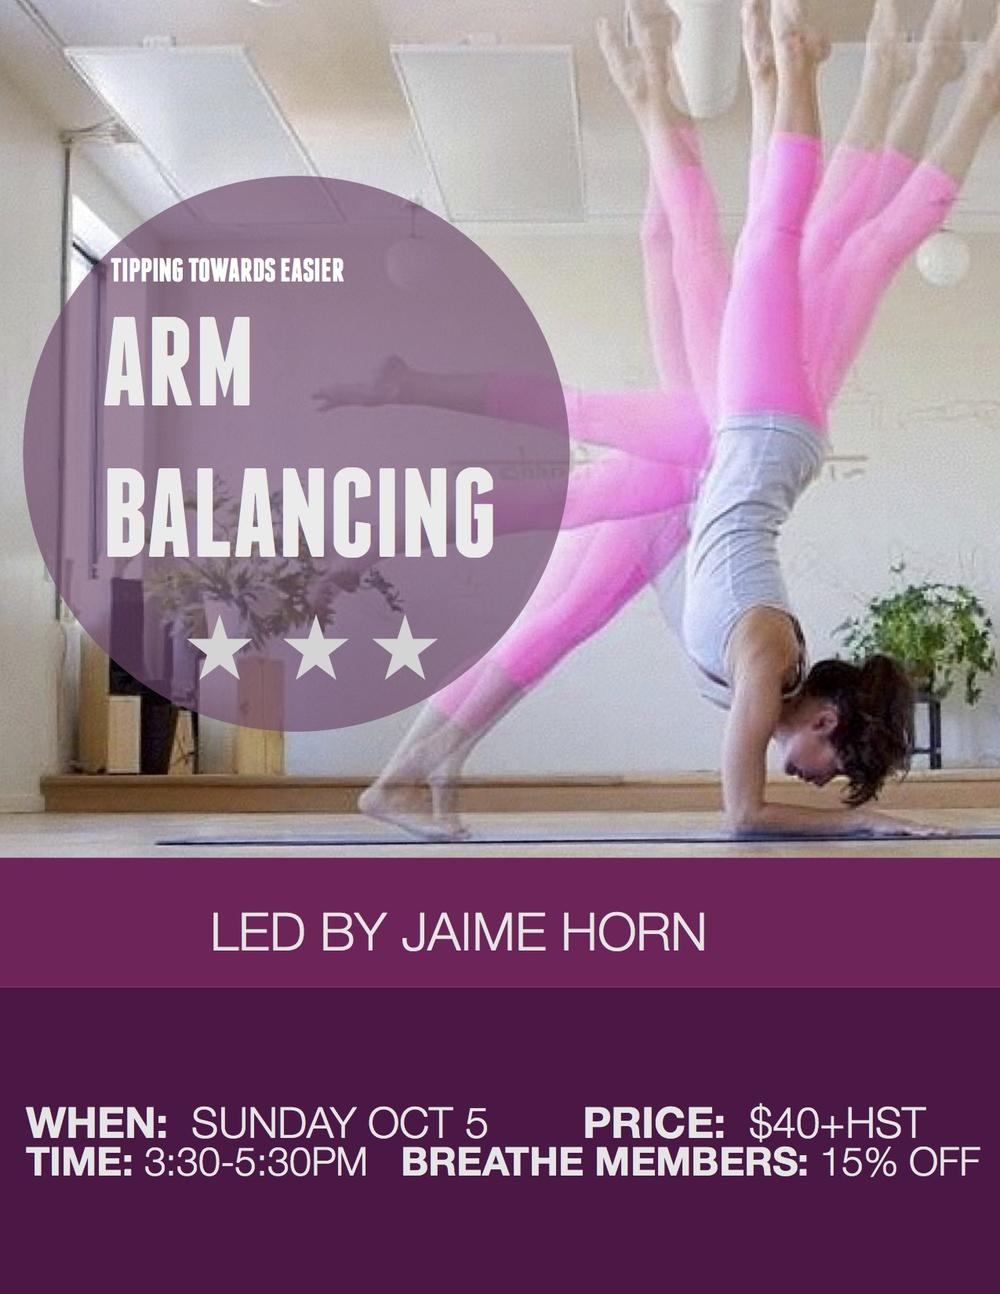 Full house of flyers!! You yogis amaze me : )